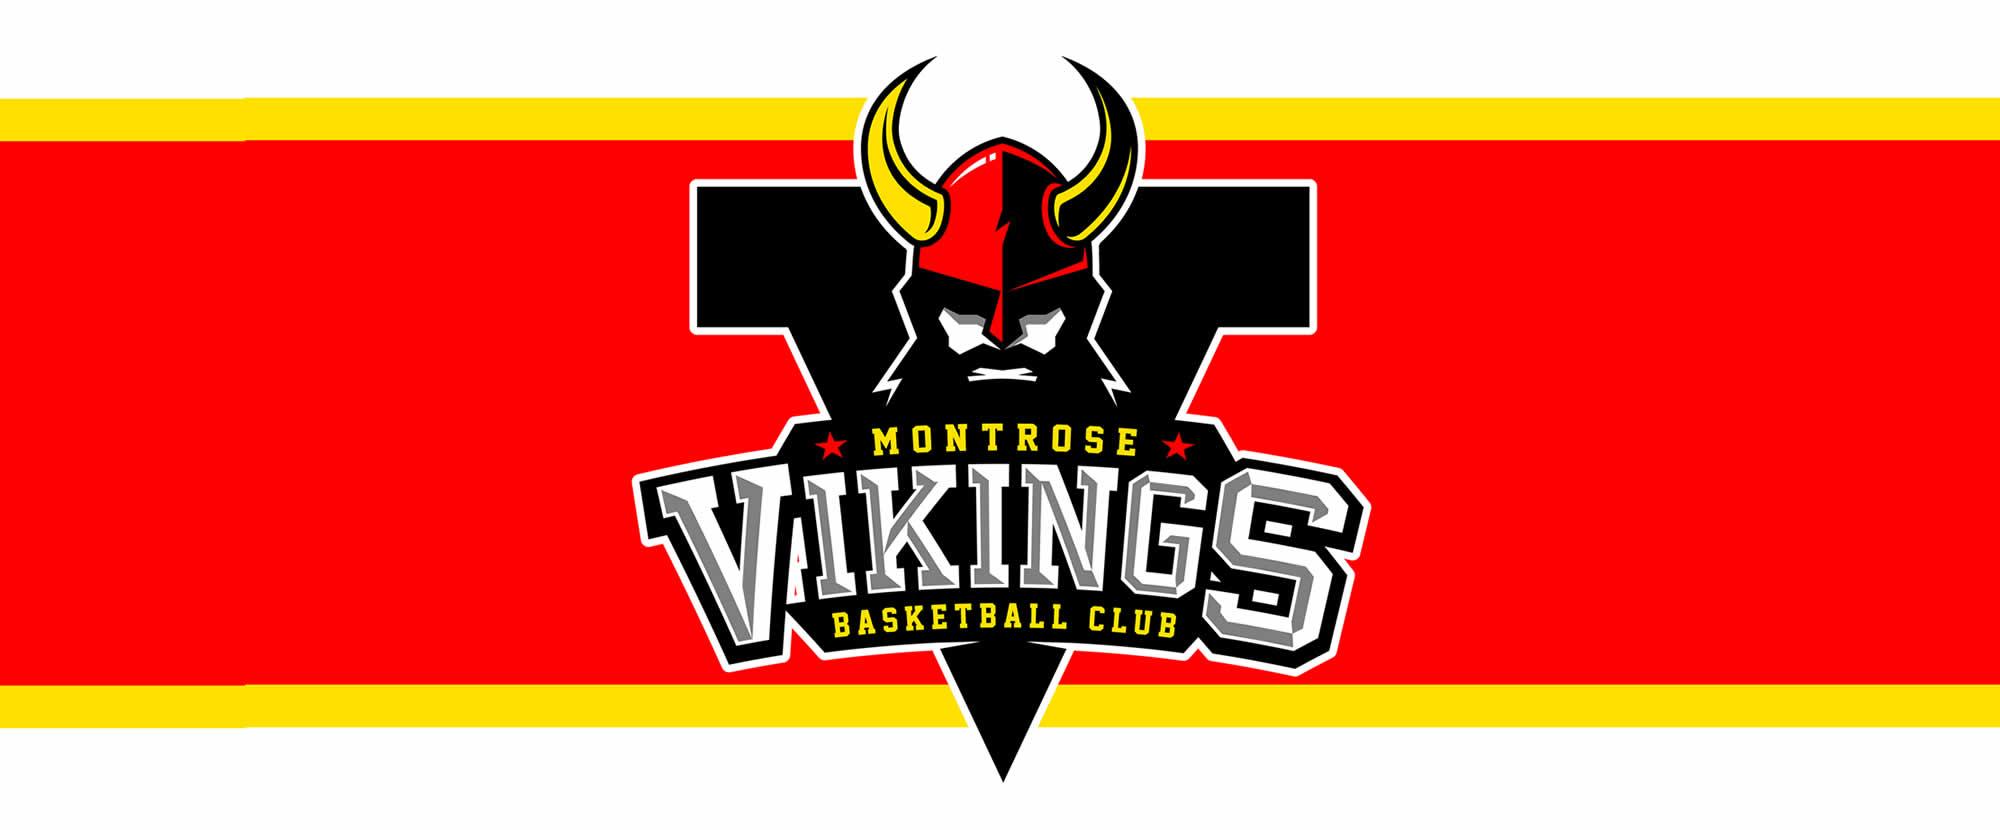 Montrose Vikings Basketball Club